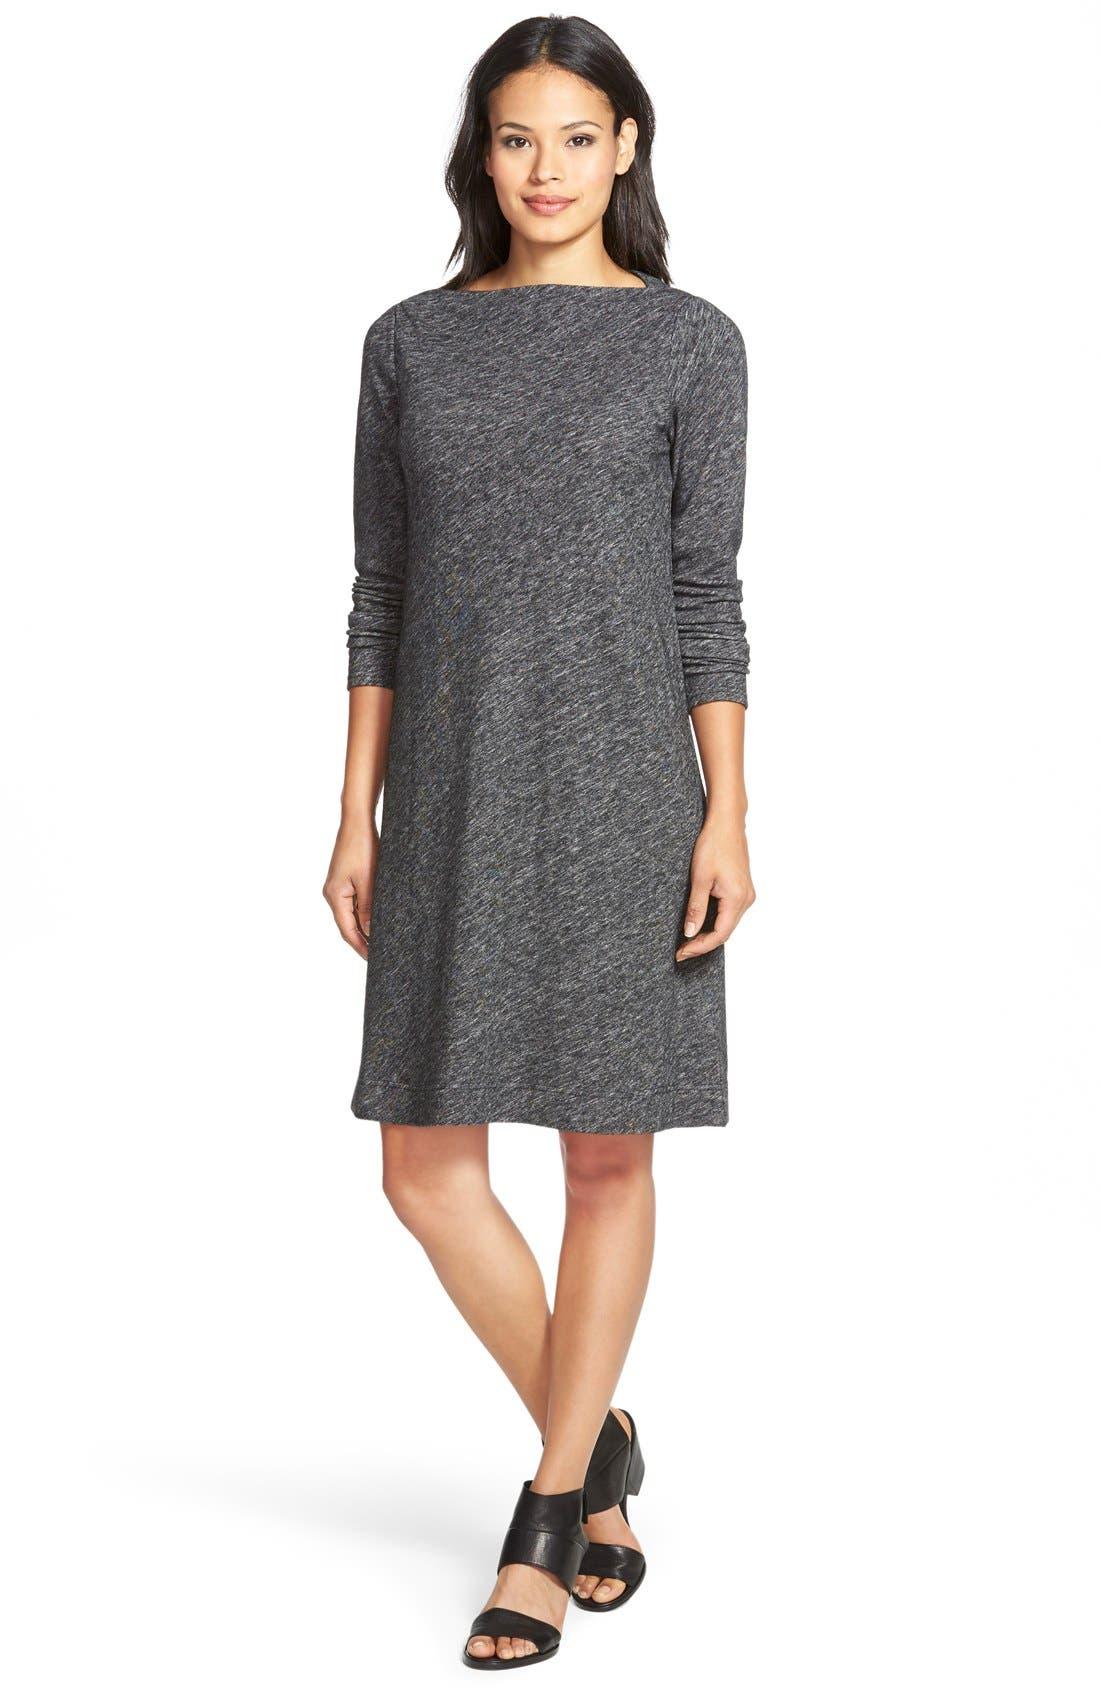 Bateau Neck Knit ShiftDress,                         Main,                         color, Charcoal